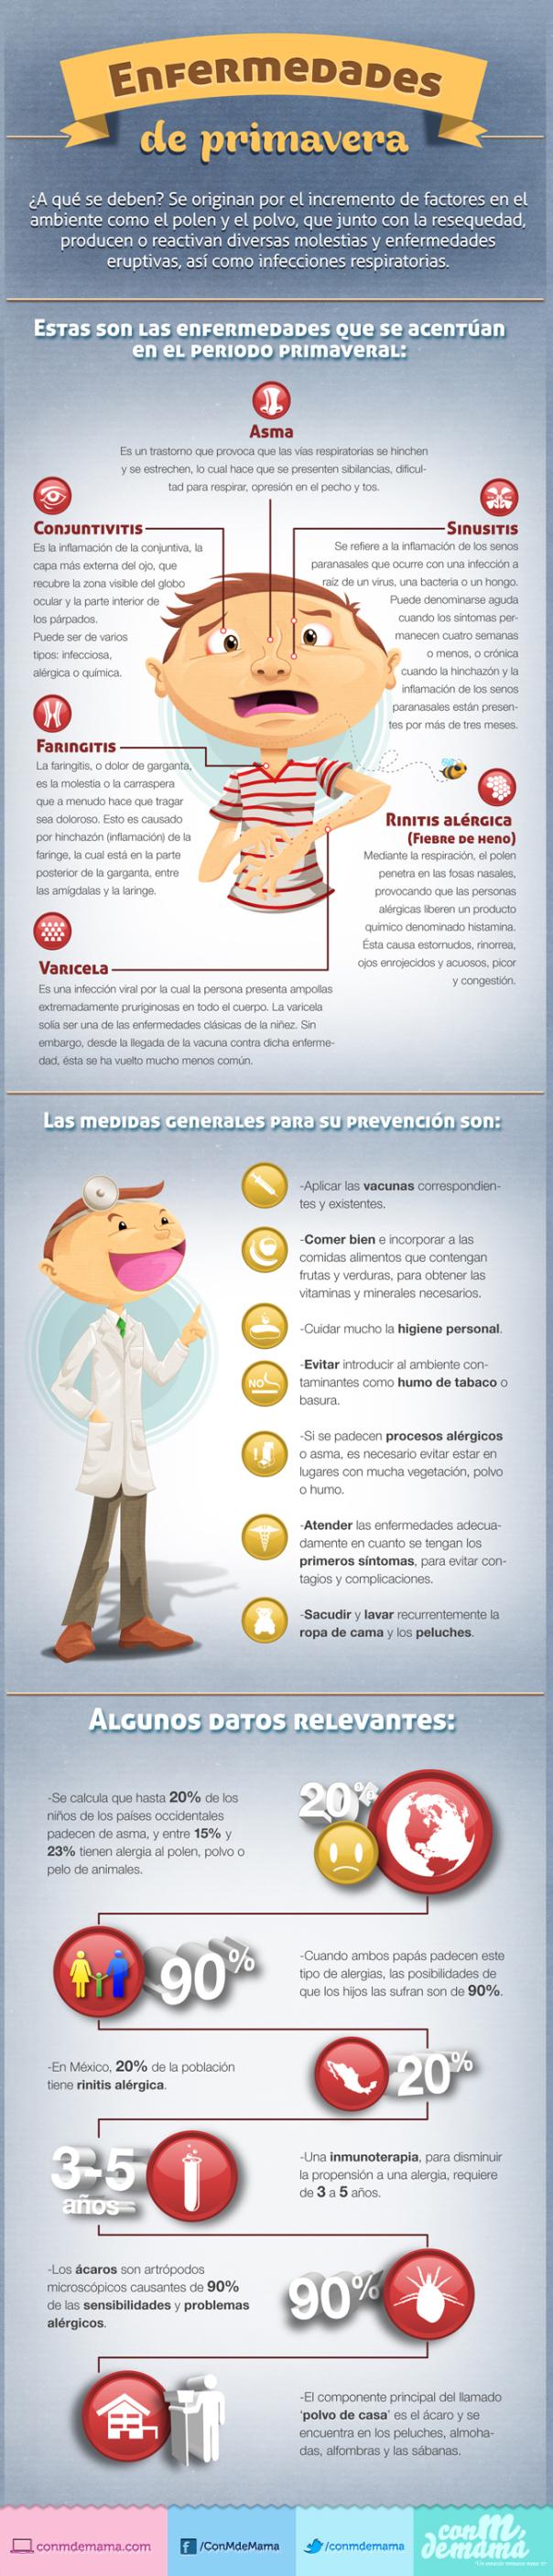 Enfermedades de primavera #infografia #infographic #health